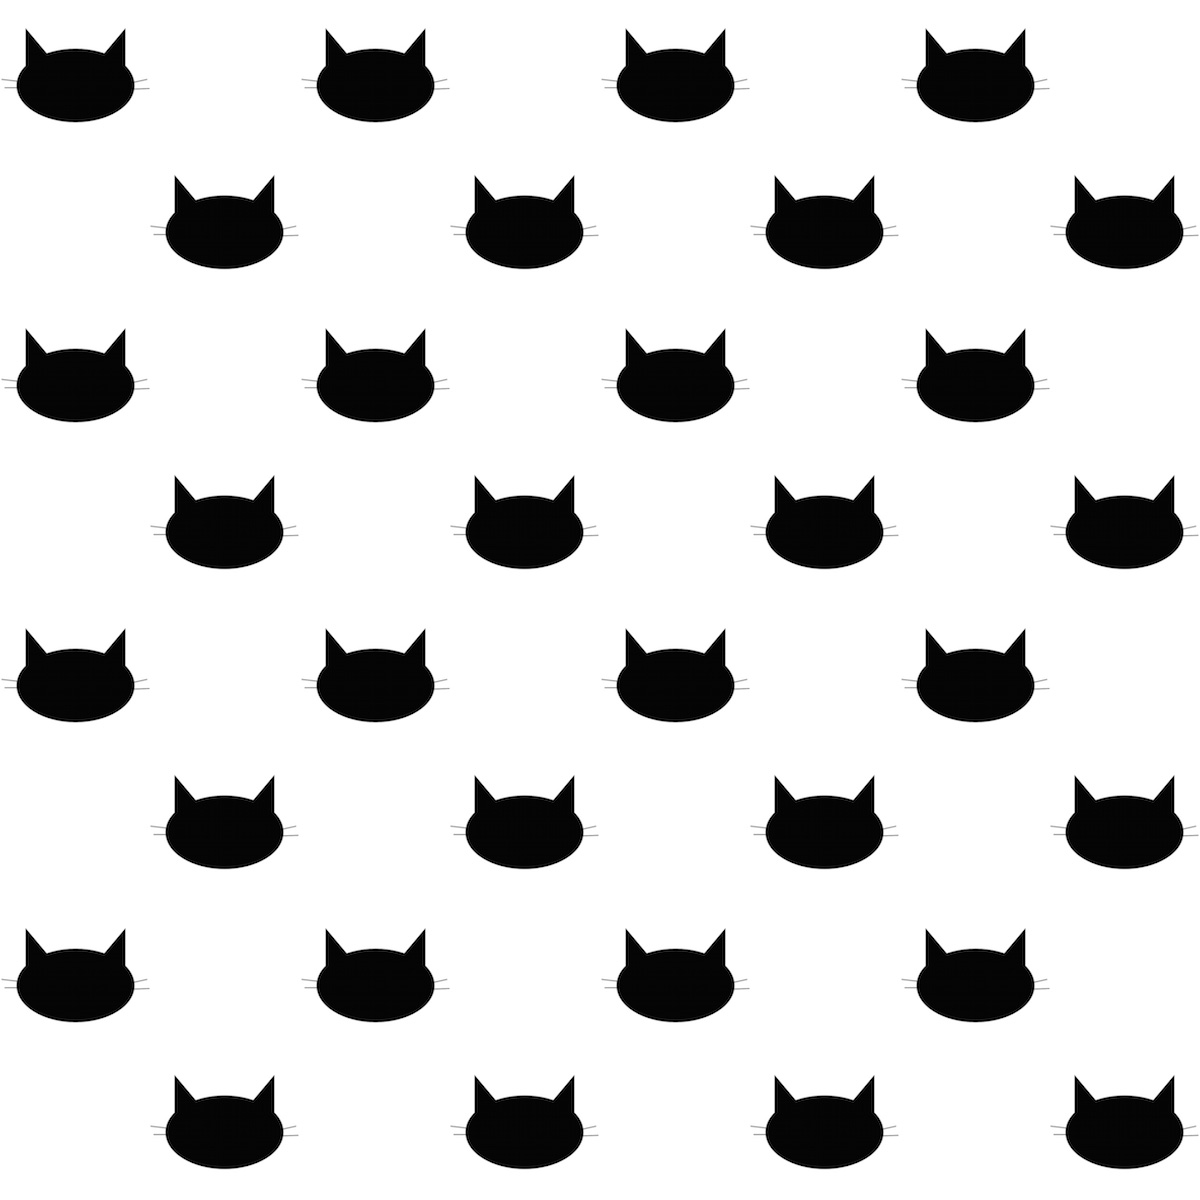 Free digital cat scrapbooking paper - ausdruckbares